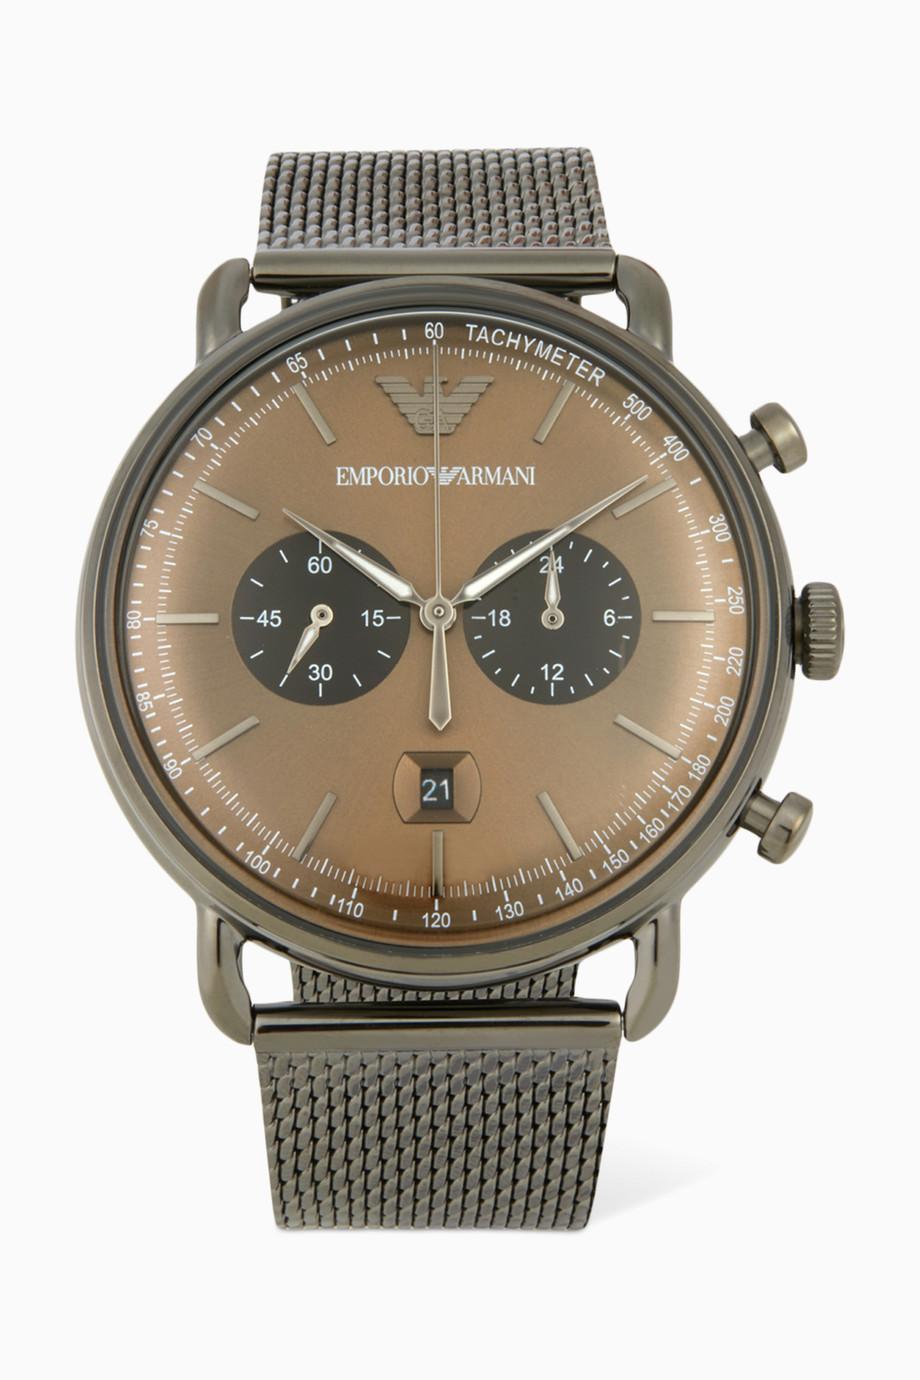 a056c104f تسوق ساعة كرونوغراف أفييتور ستانلس ستيل Emporio Armani ملون للرجال ...